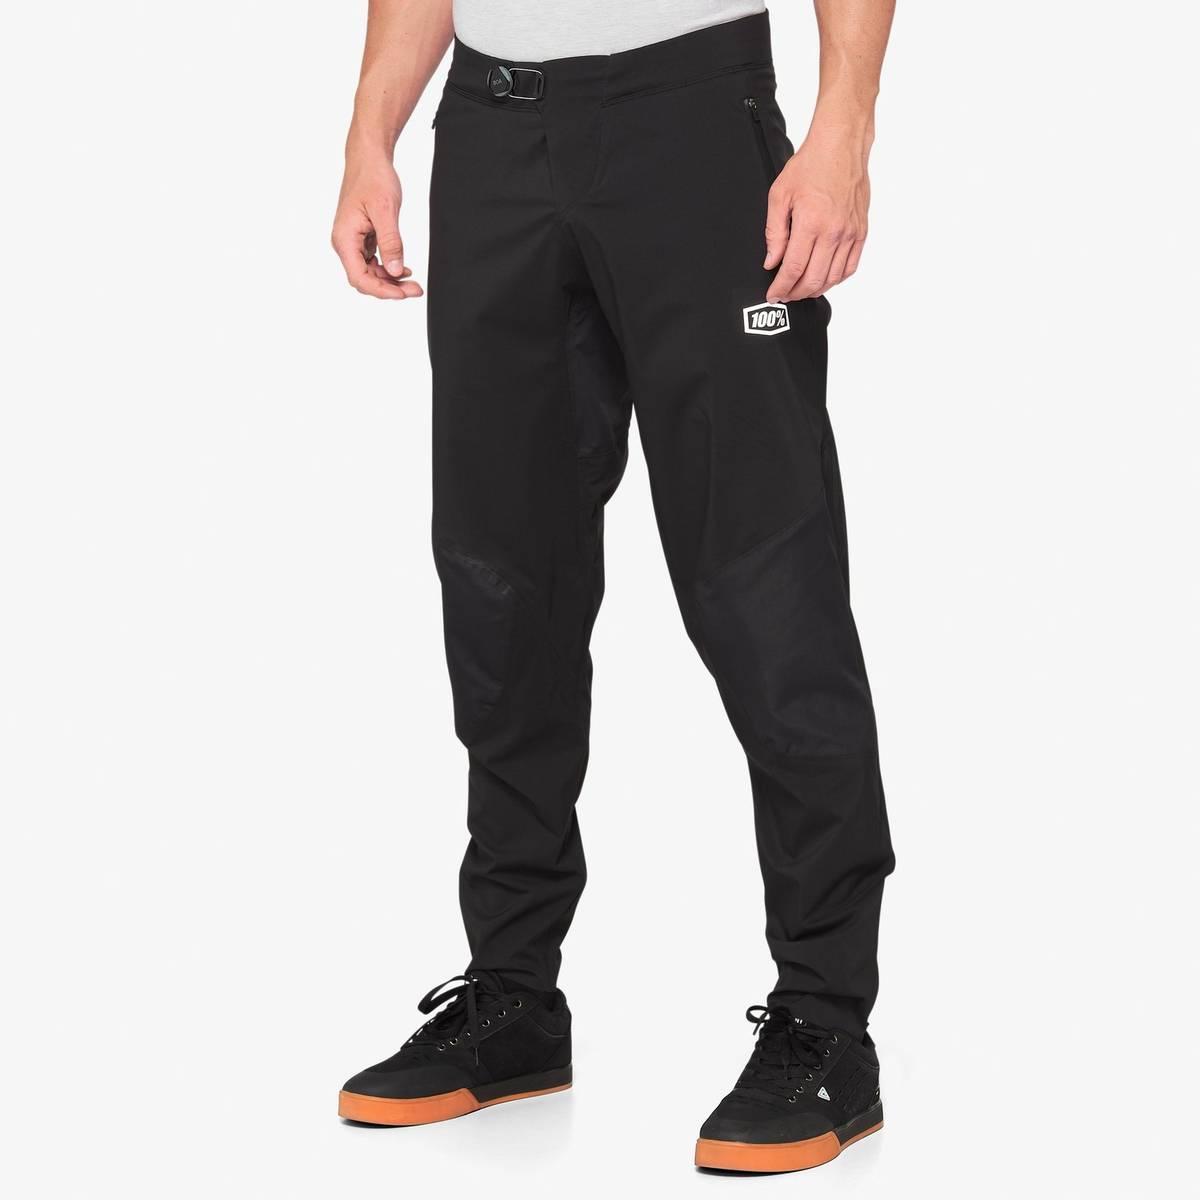 100% HYDROMATIC Pants Black